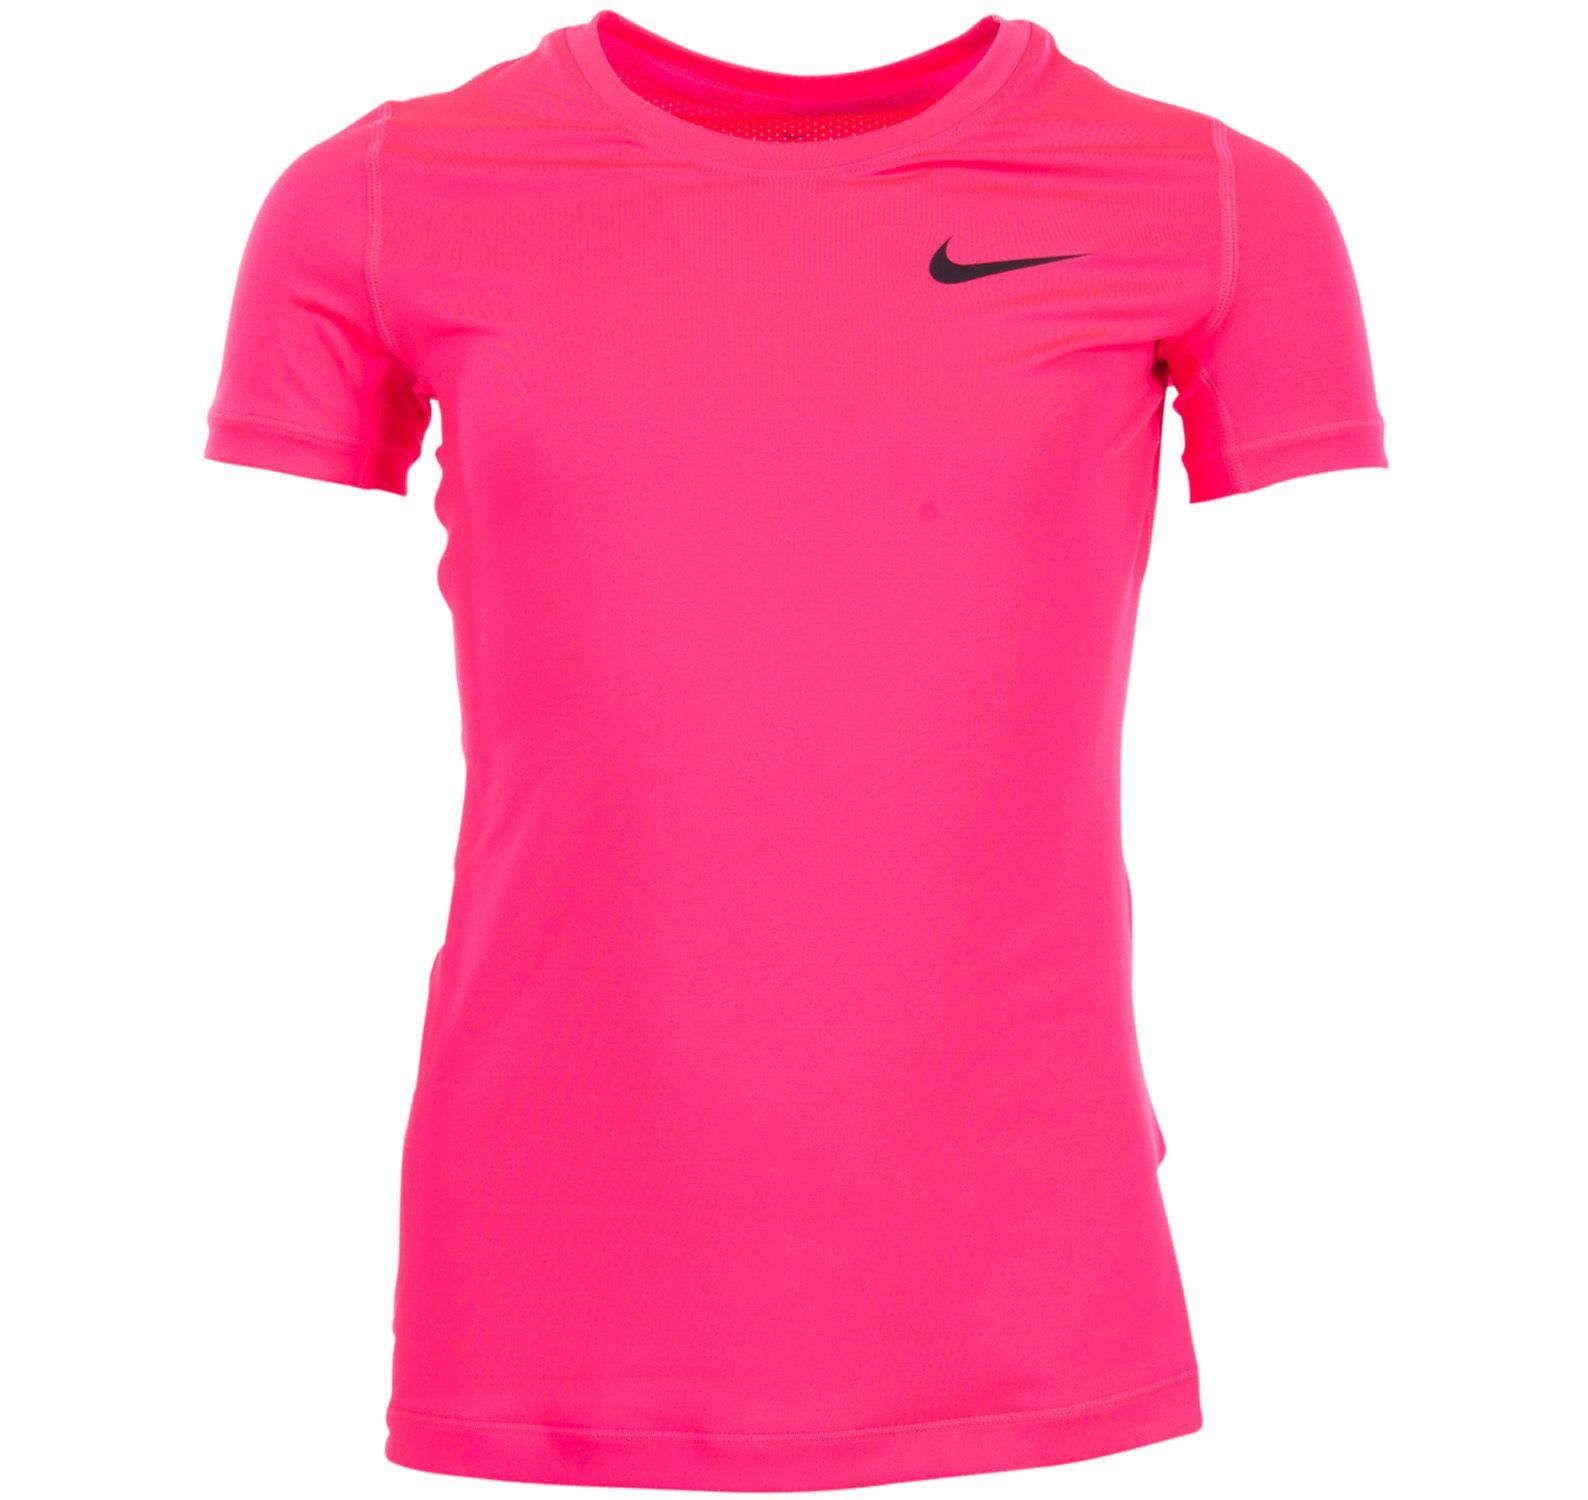 G Np Top Ss, Racer Pink/Racer Pink/Black, Xs,  T-Shirts